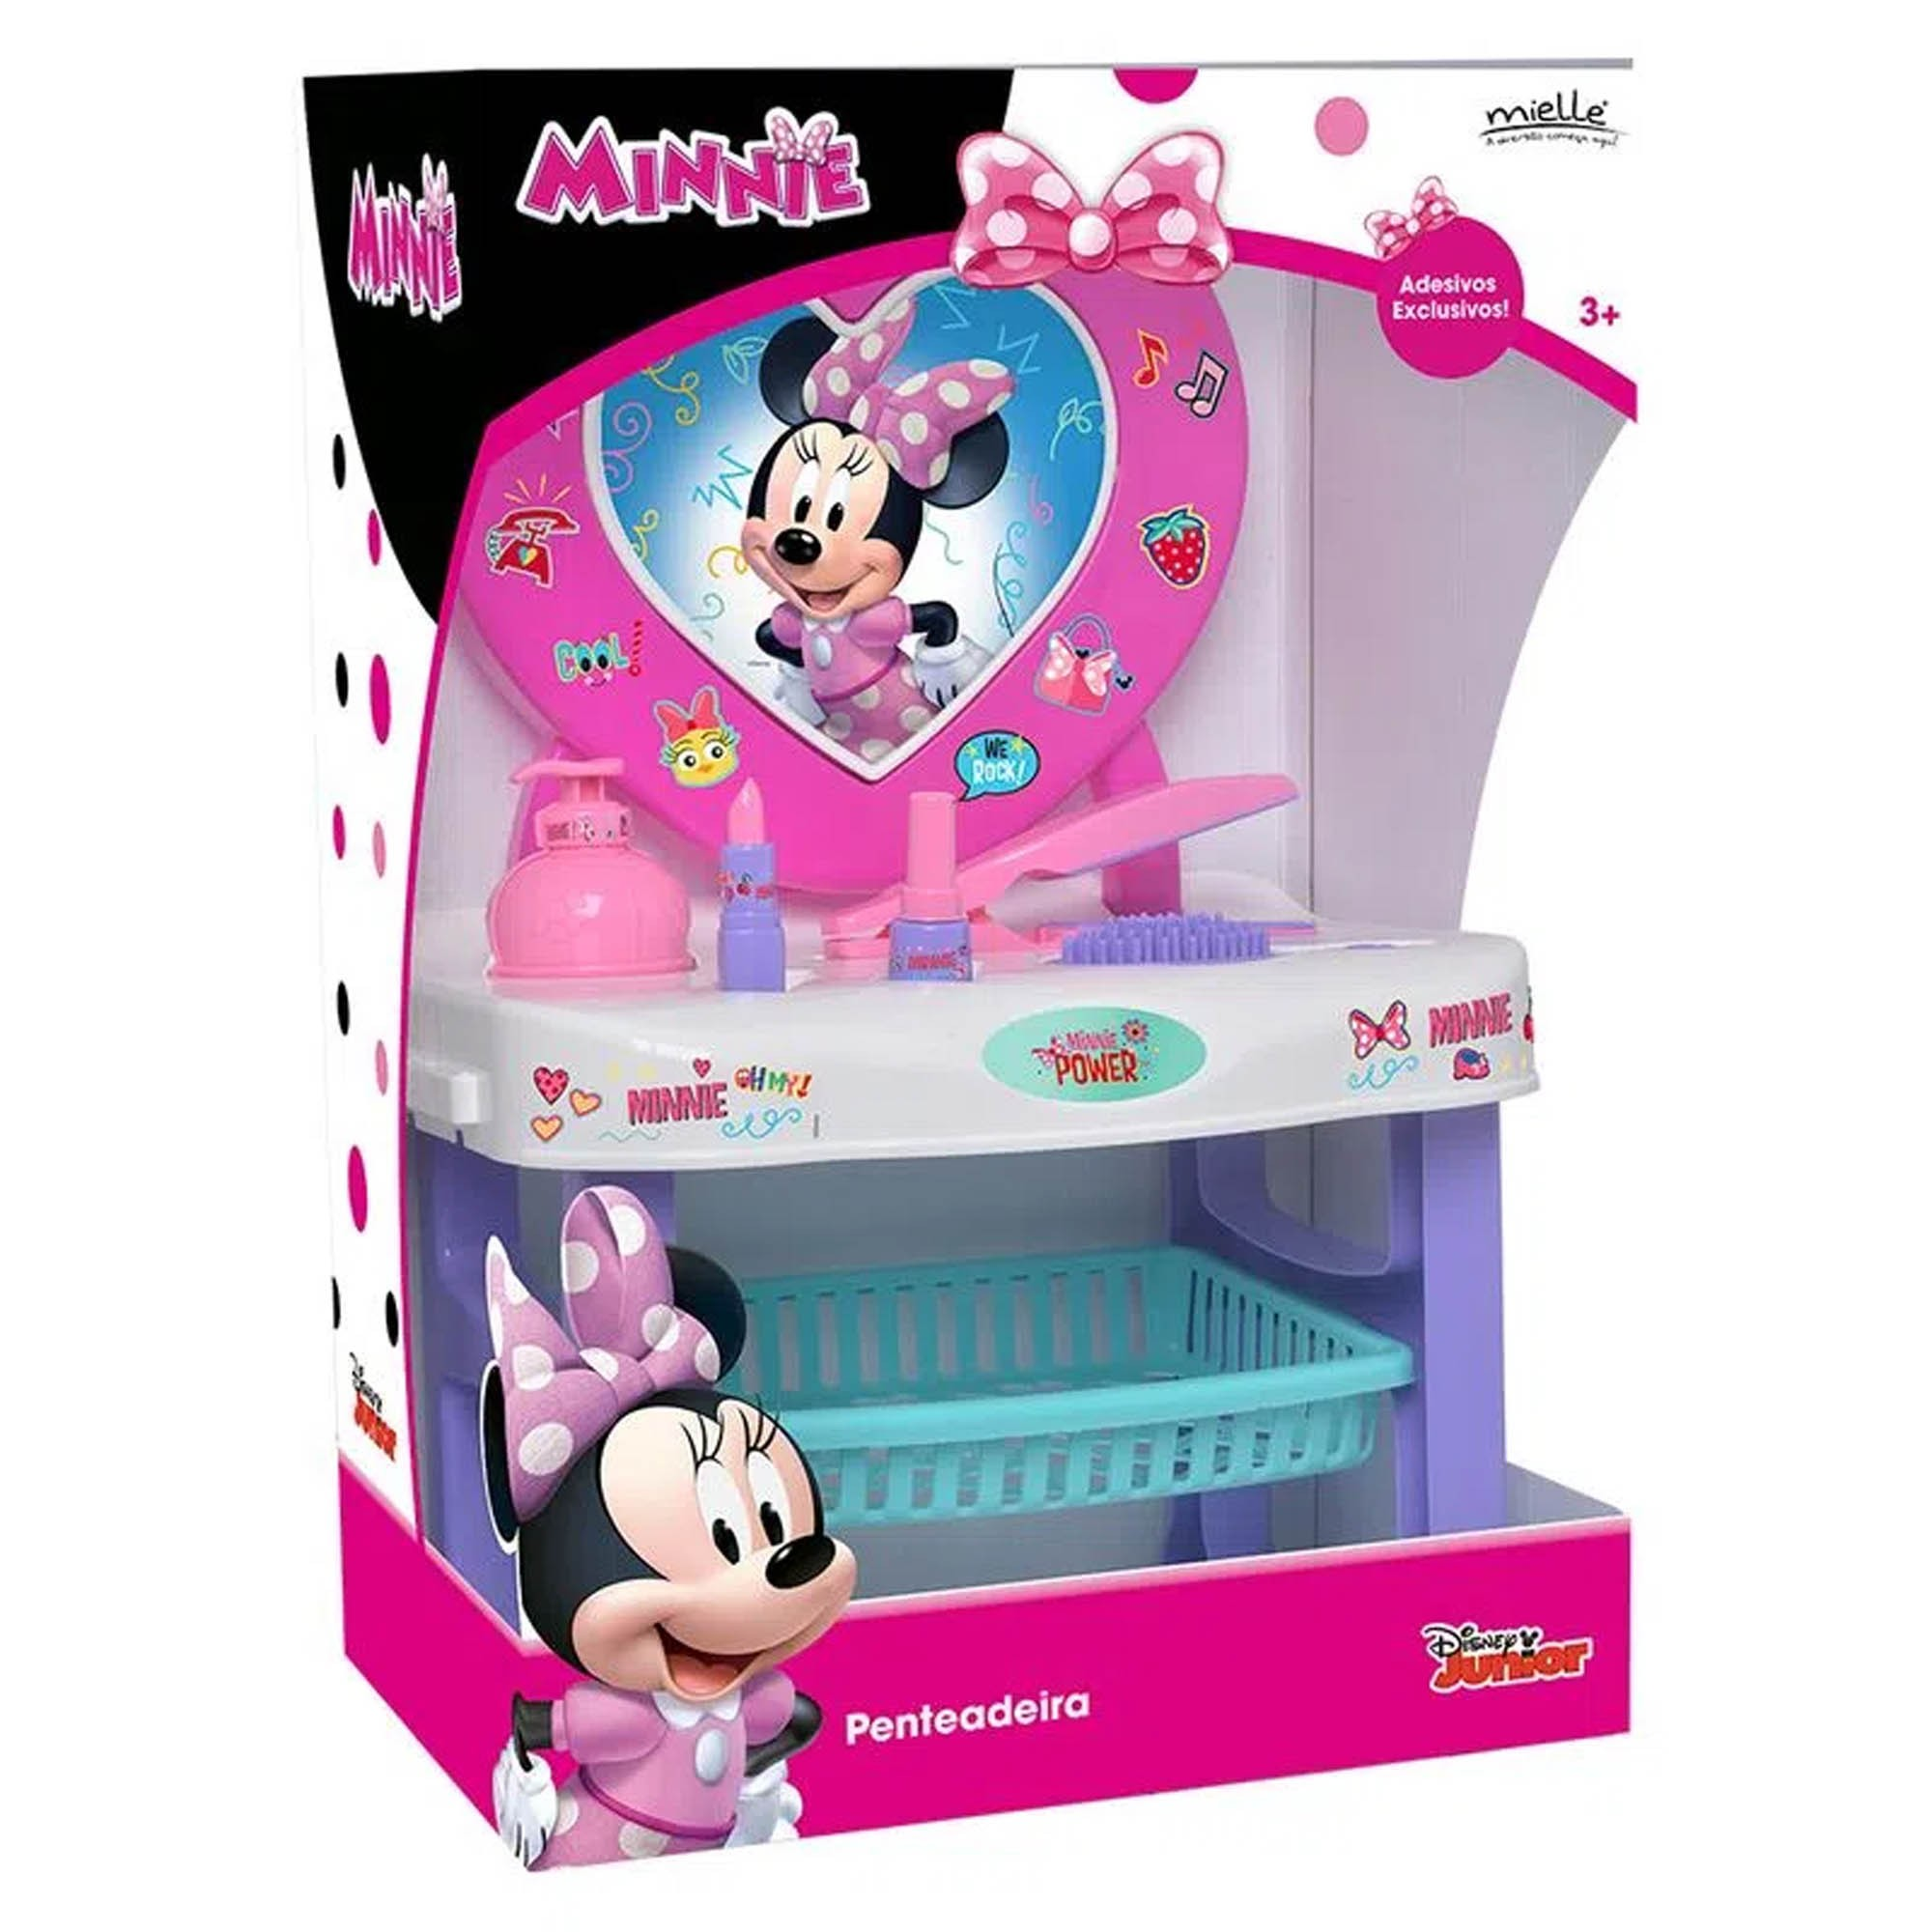 Penteadeira de Maquiagem e Beleza Infantil Minnie Disney - Mielle